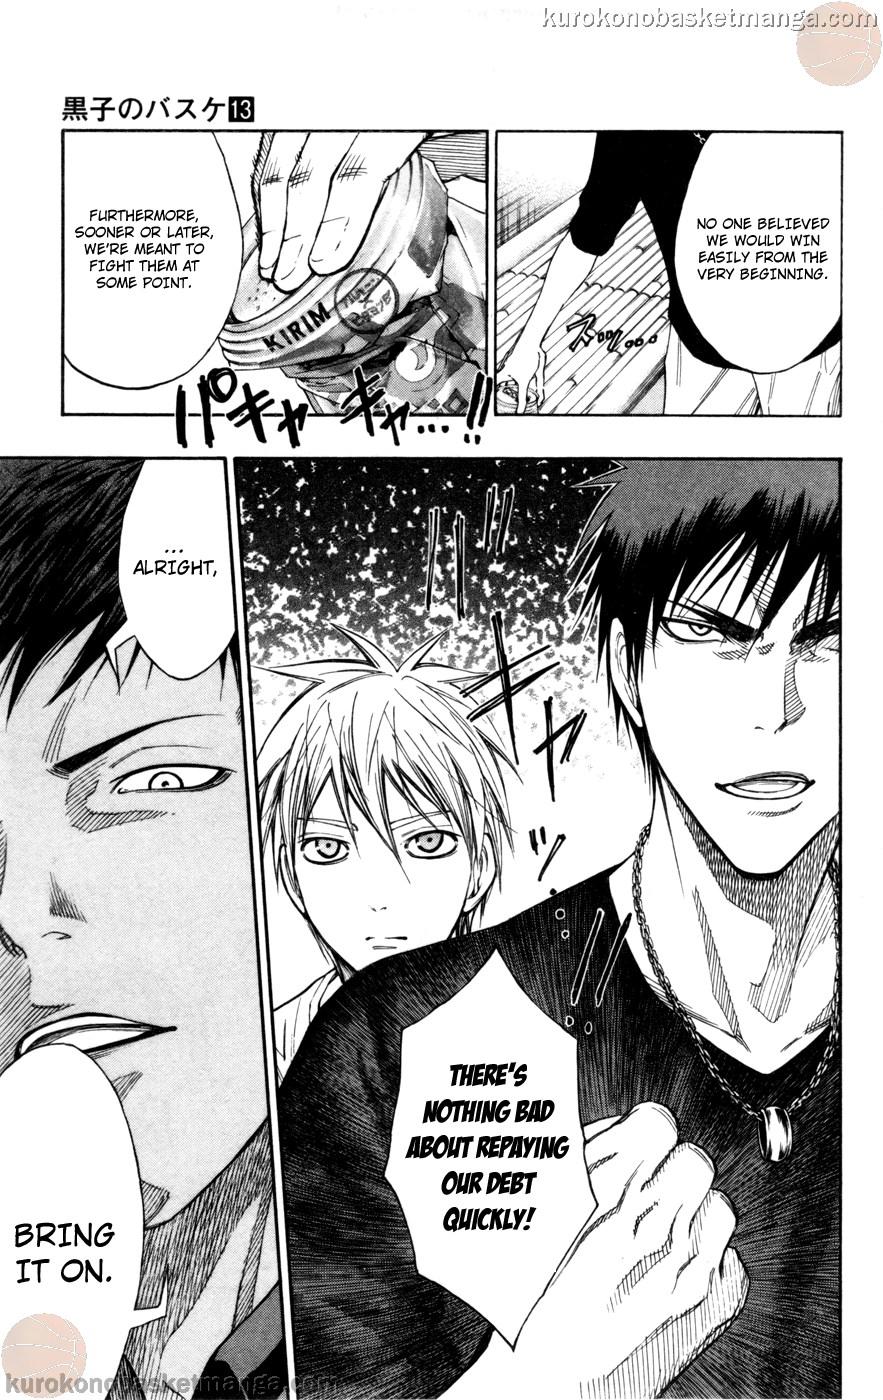 Kuroko no Basket Manga Chapter 110 - Image 19